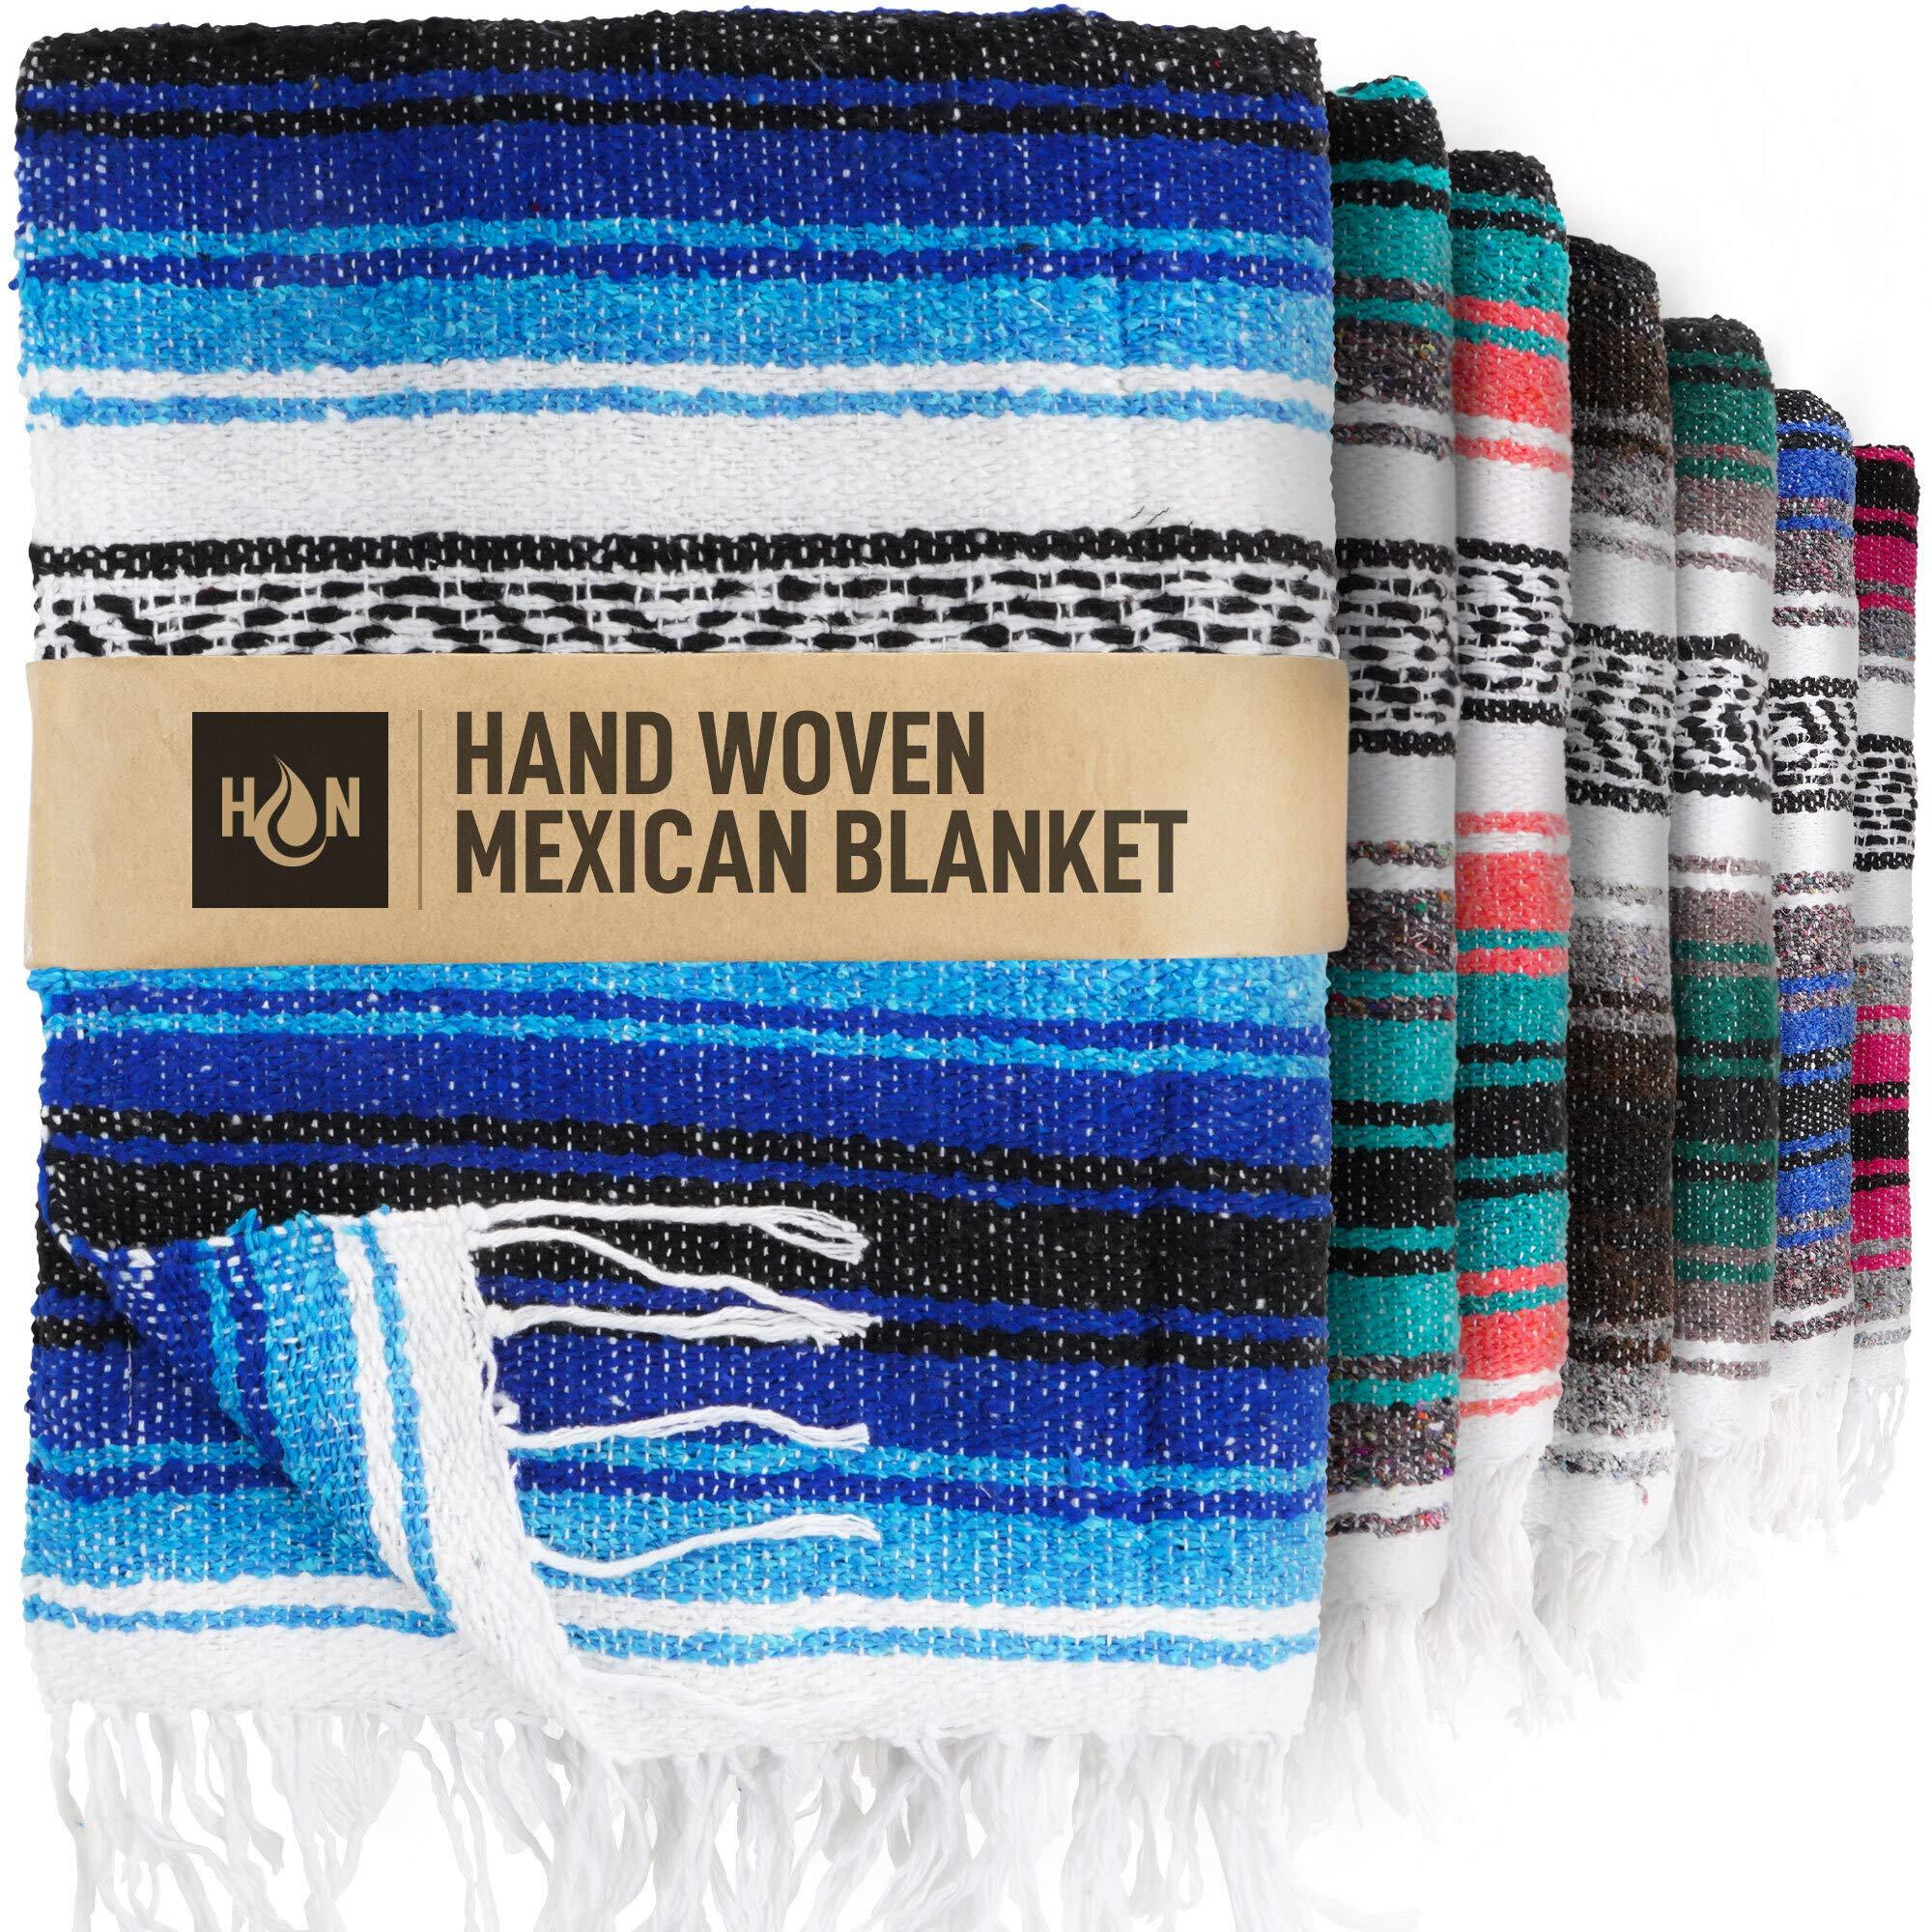 Handcrafted Large Mexican Blankets, Artisanal Handwoven Serape Blanket, Authentic Falsa Blanket, Beach Blanket, Camping Blanket, Picnic Blanket, Outdoor Blanket, Boho Throw Blankets, King Turquoise